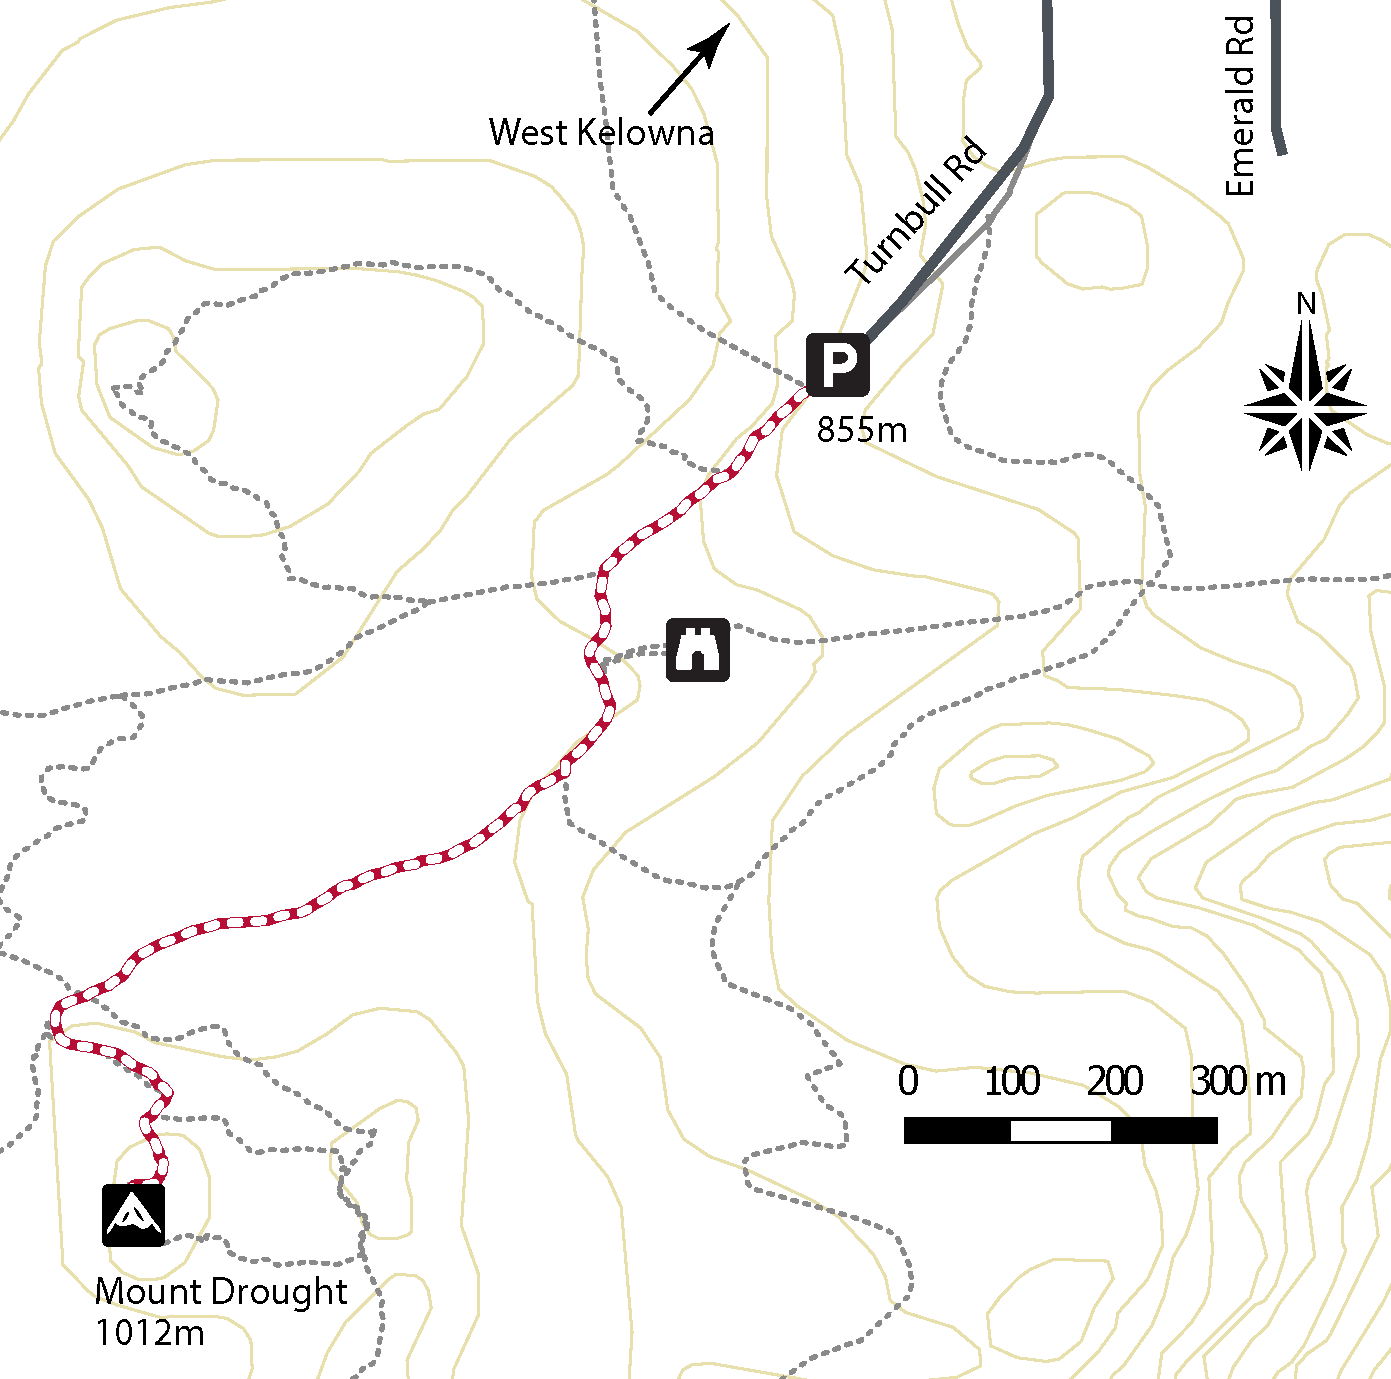 Trail map around Mt. Drought Summit